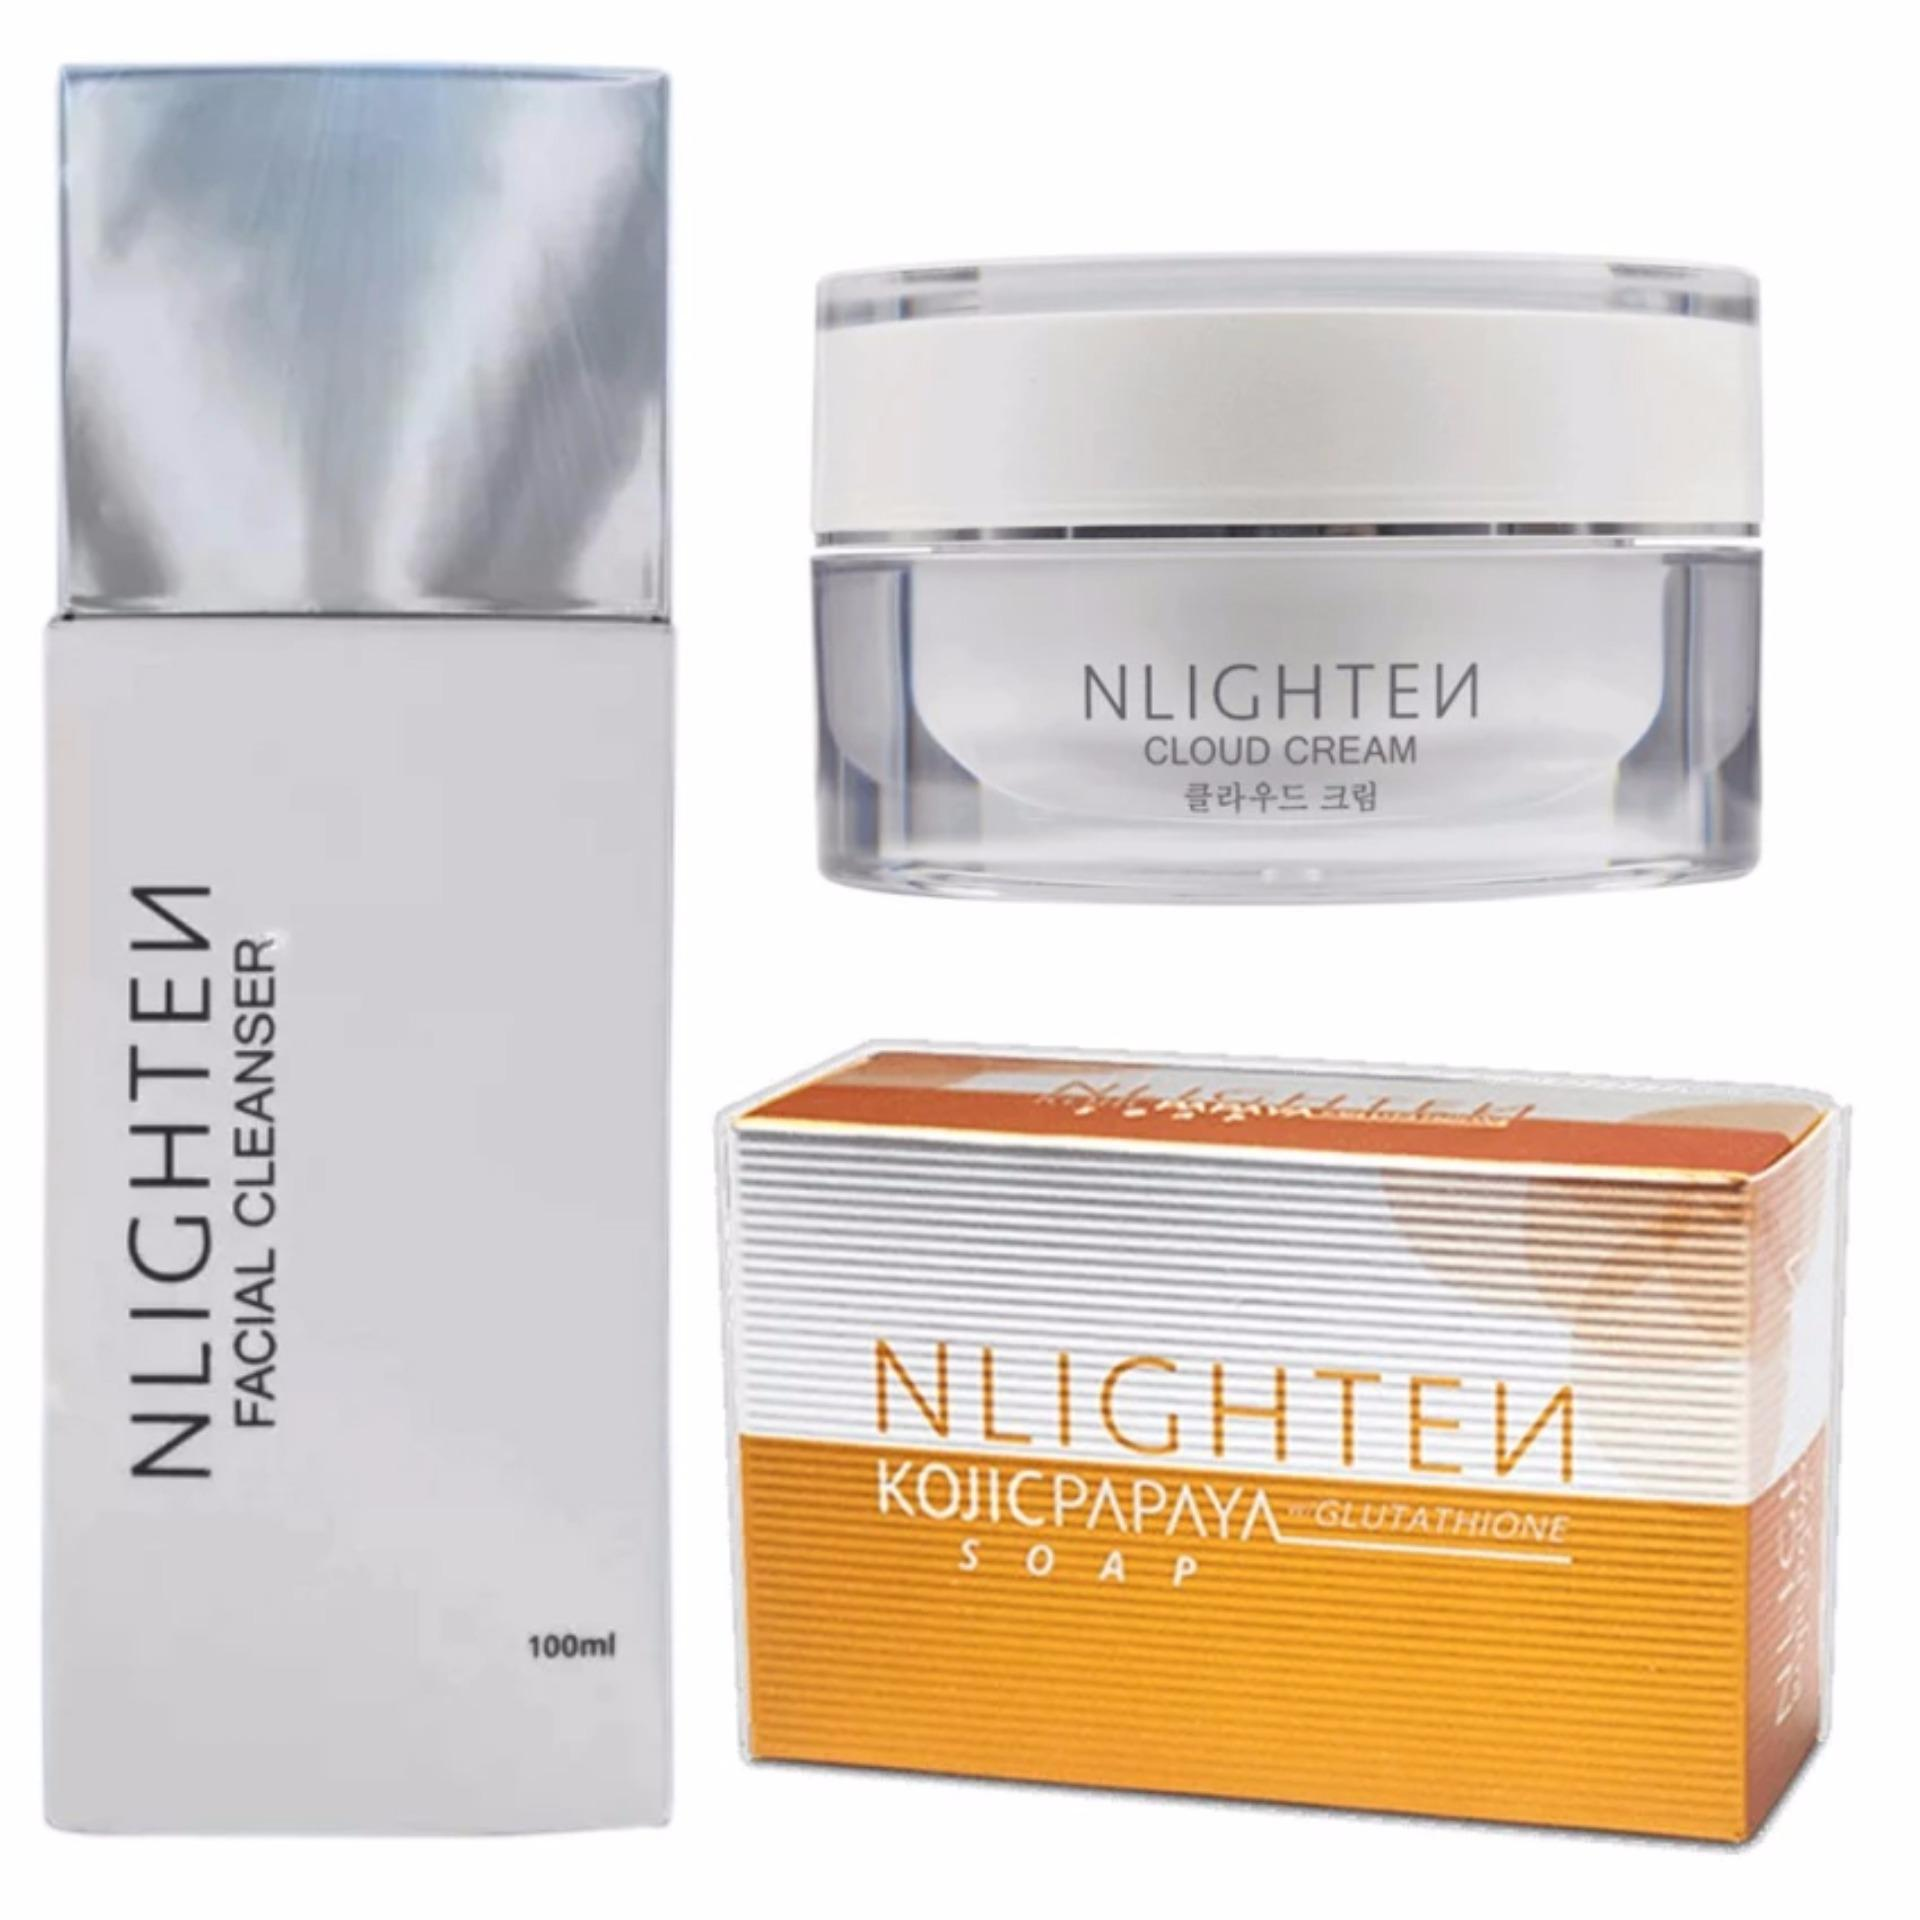 Philippines Nlighten Set For Acne Solution The Best Price In